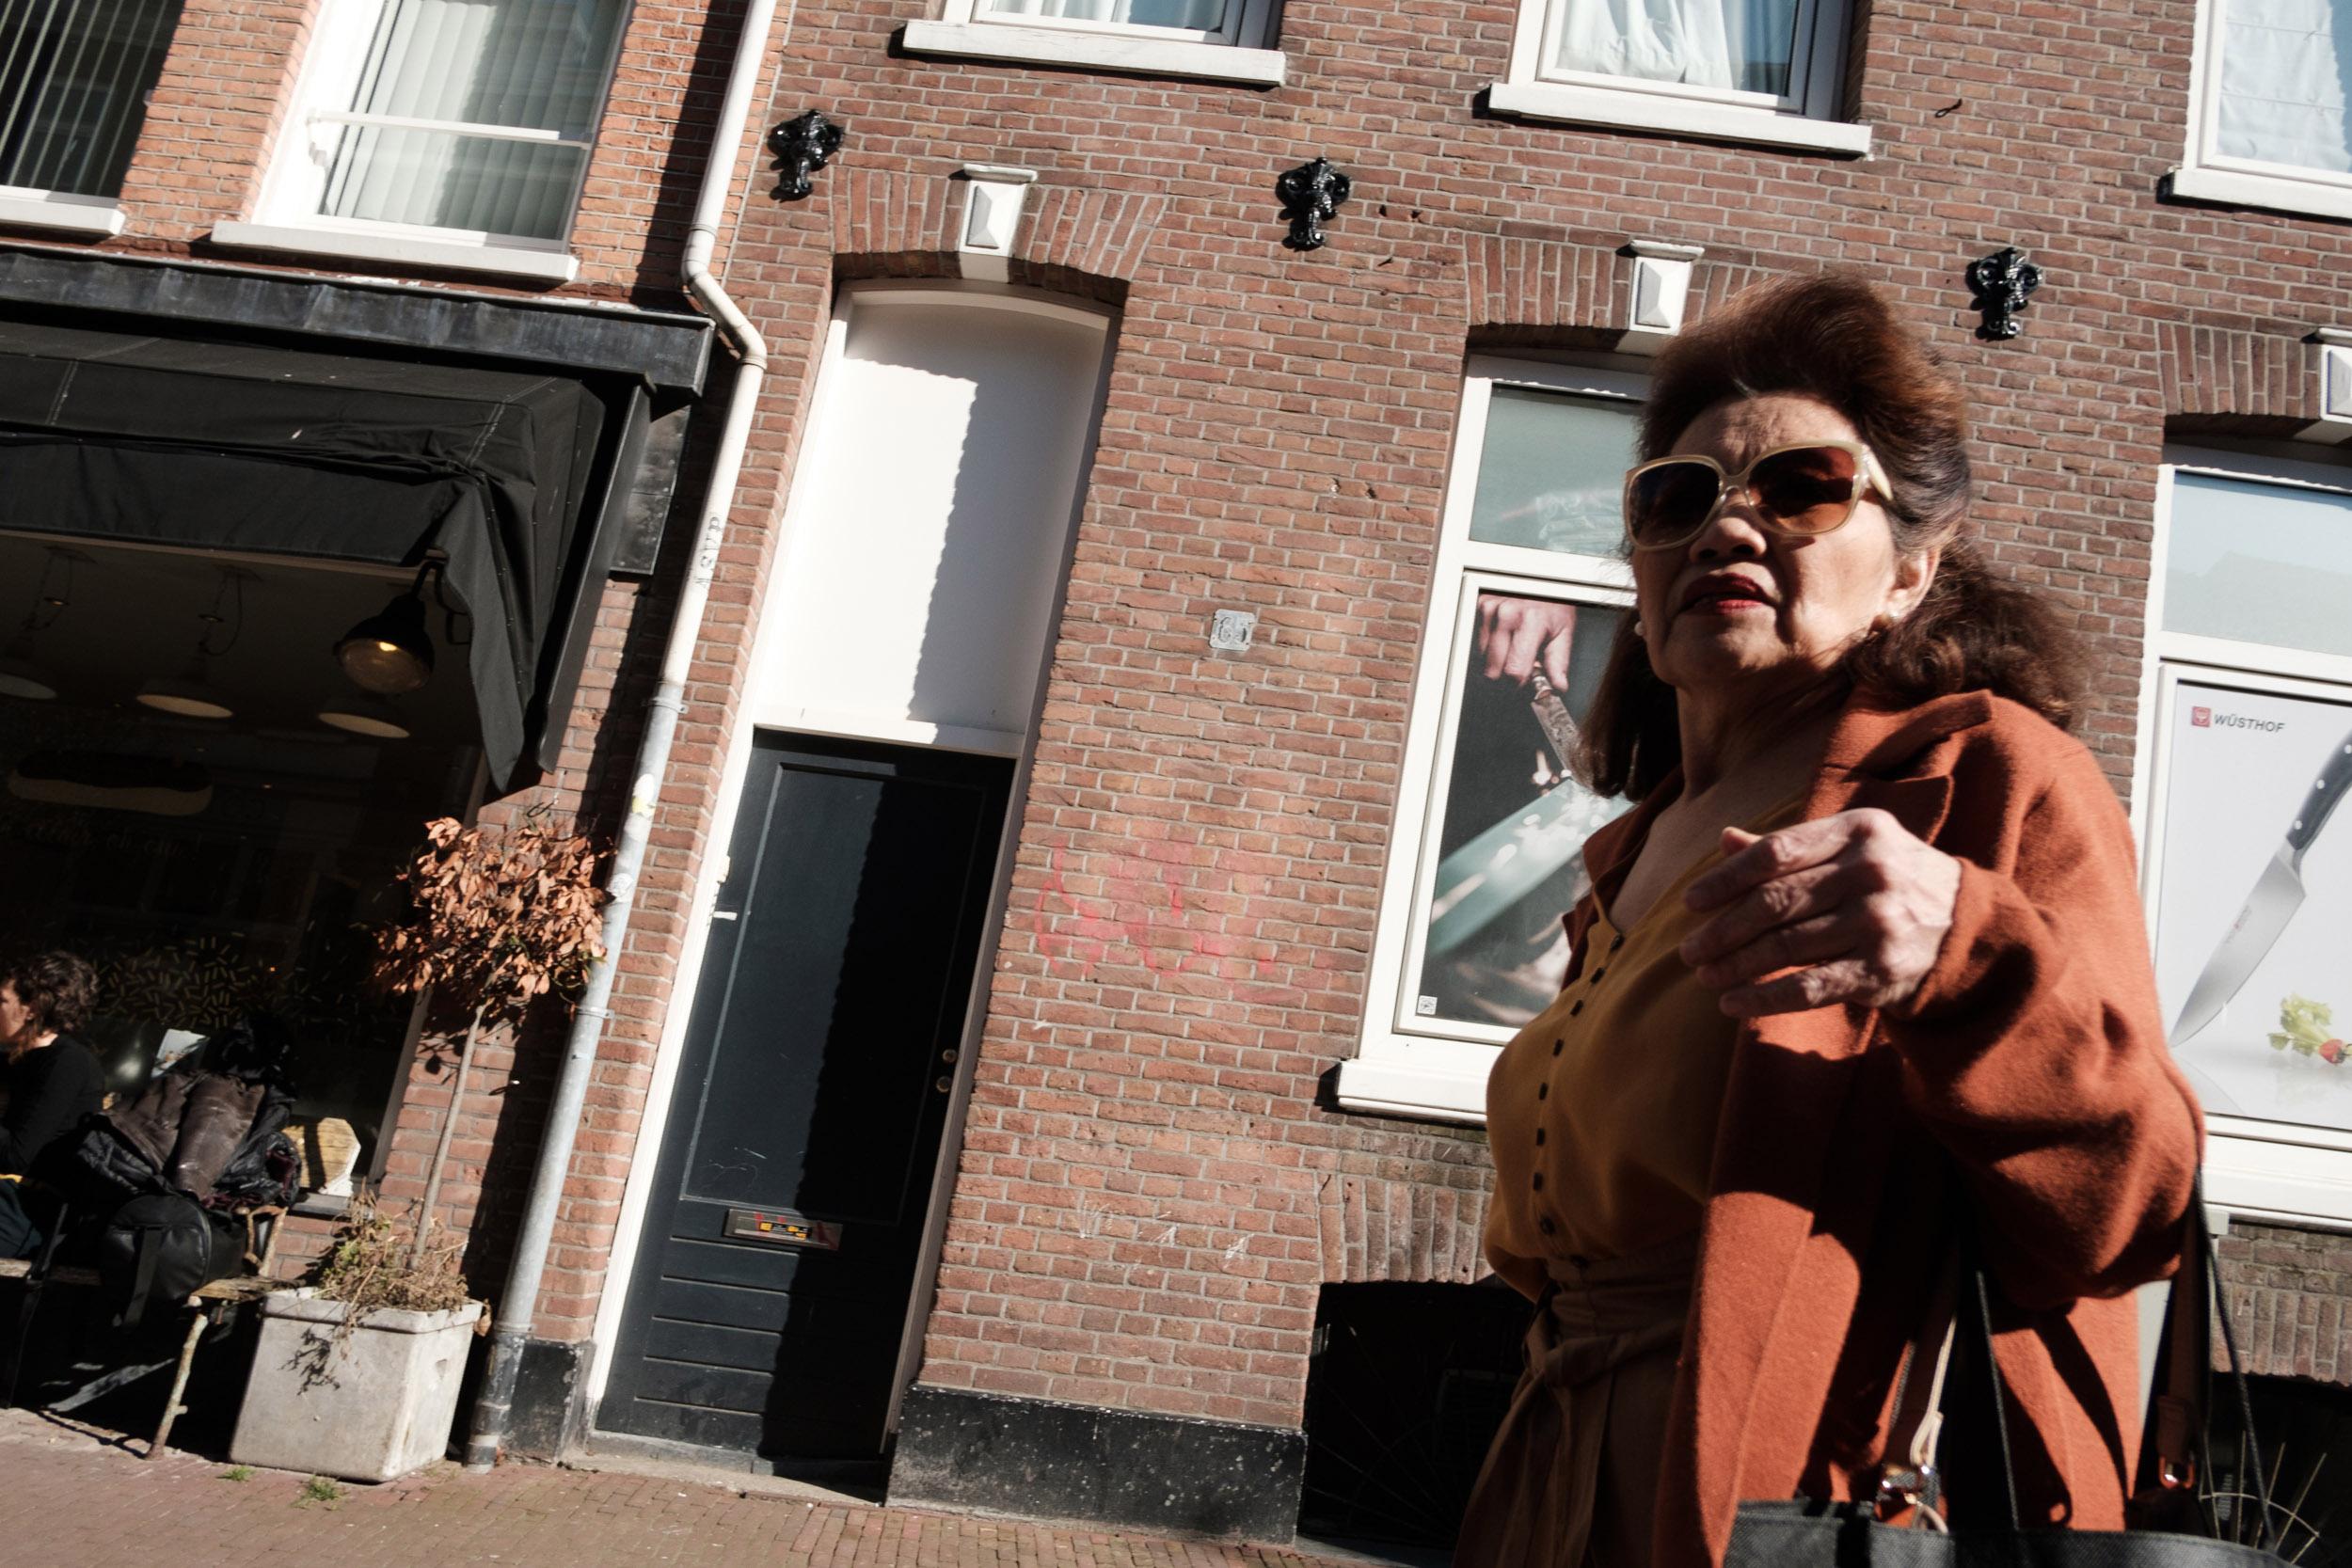 jimparker-amsterdam-street-photography-1.jpg